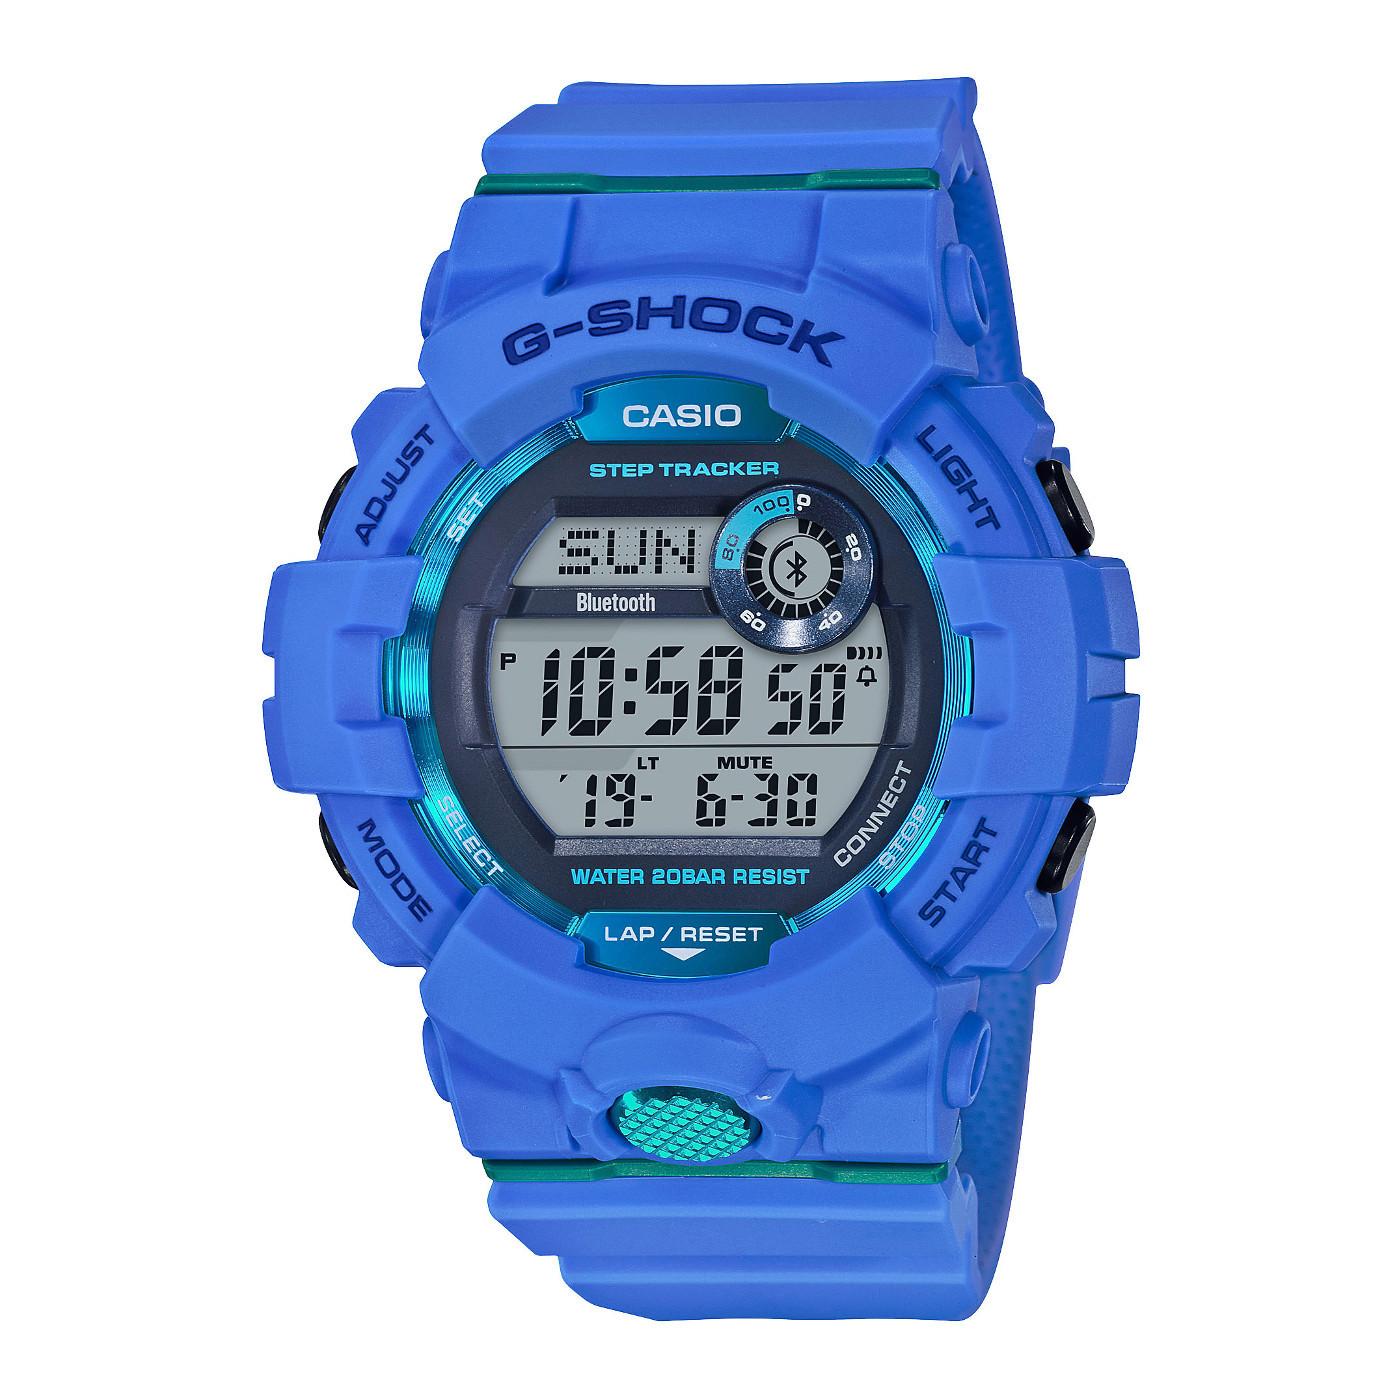 G-Shock G-Squad Stepcounter Bluetooth Connected horloge GBD-800-2ER